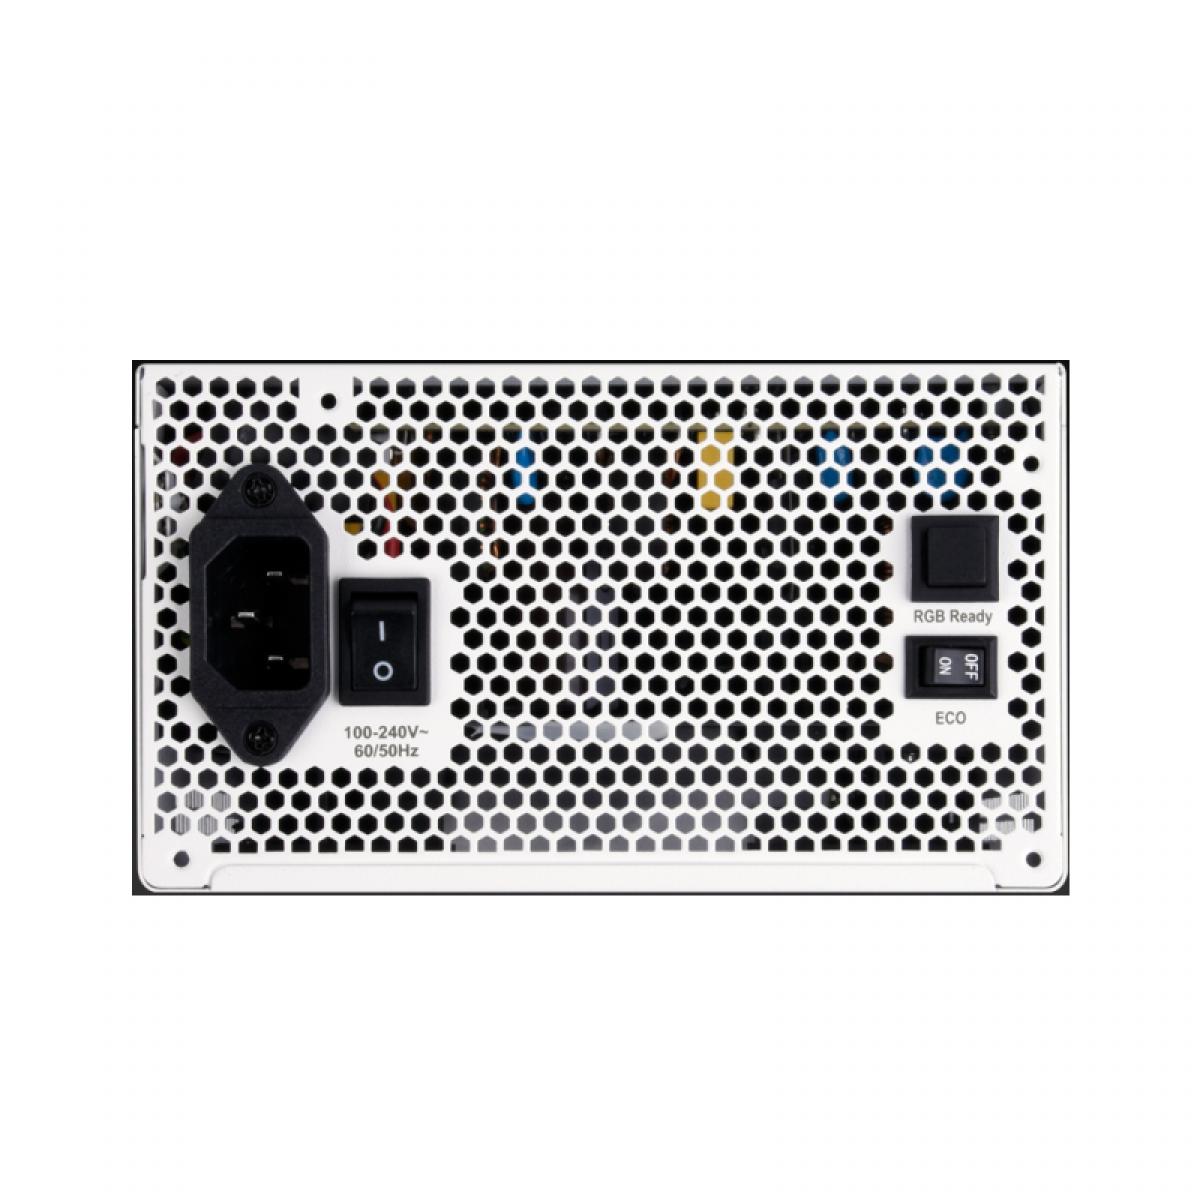 Fonte Super Flower LEADEX III ARGB 650W, 80 Plus Gold, PFC Ativo, Full Modular, SF-650F14RG(WH) - Open Box